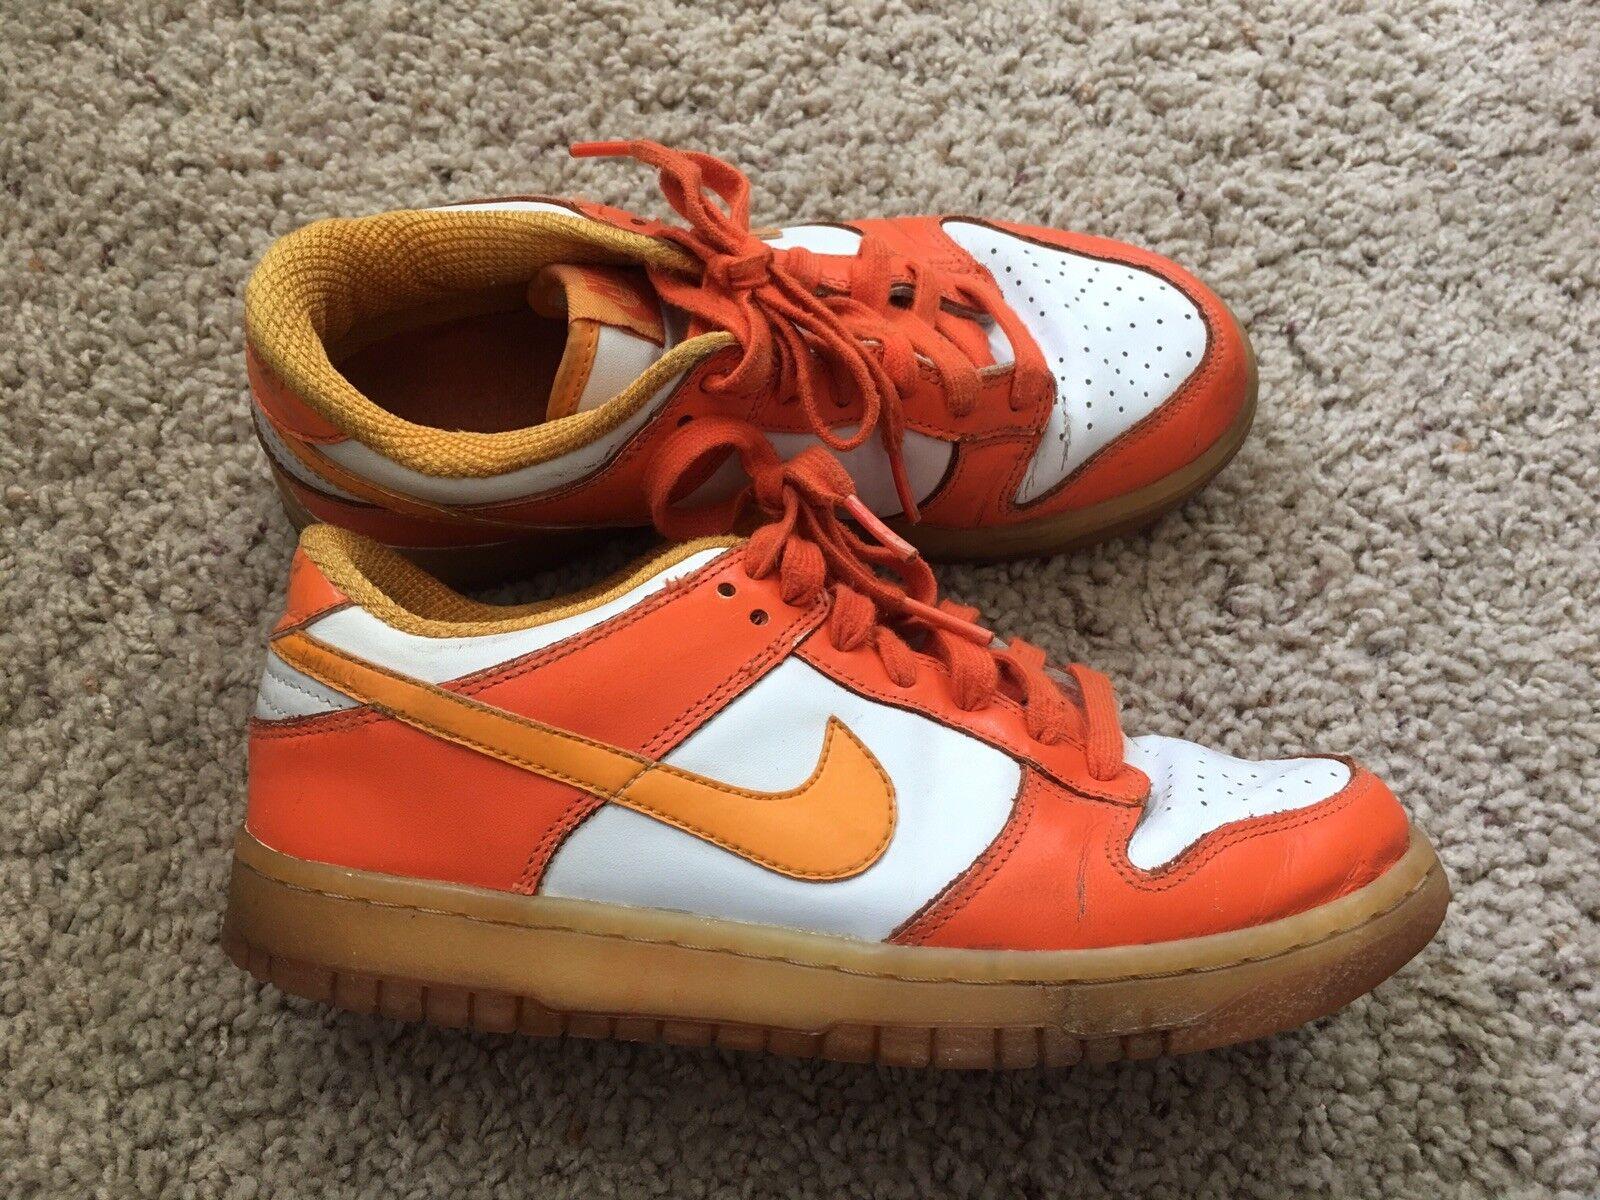 Nike Dunk Low Pro Shock Orange White Blaze Men 7.5 Preowned 2006